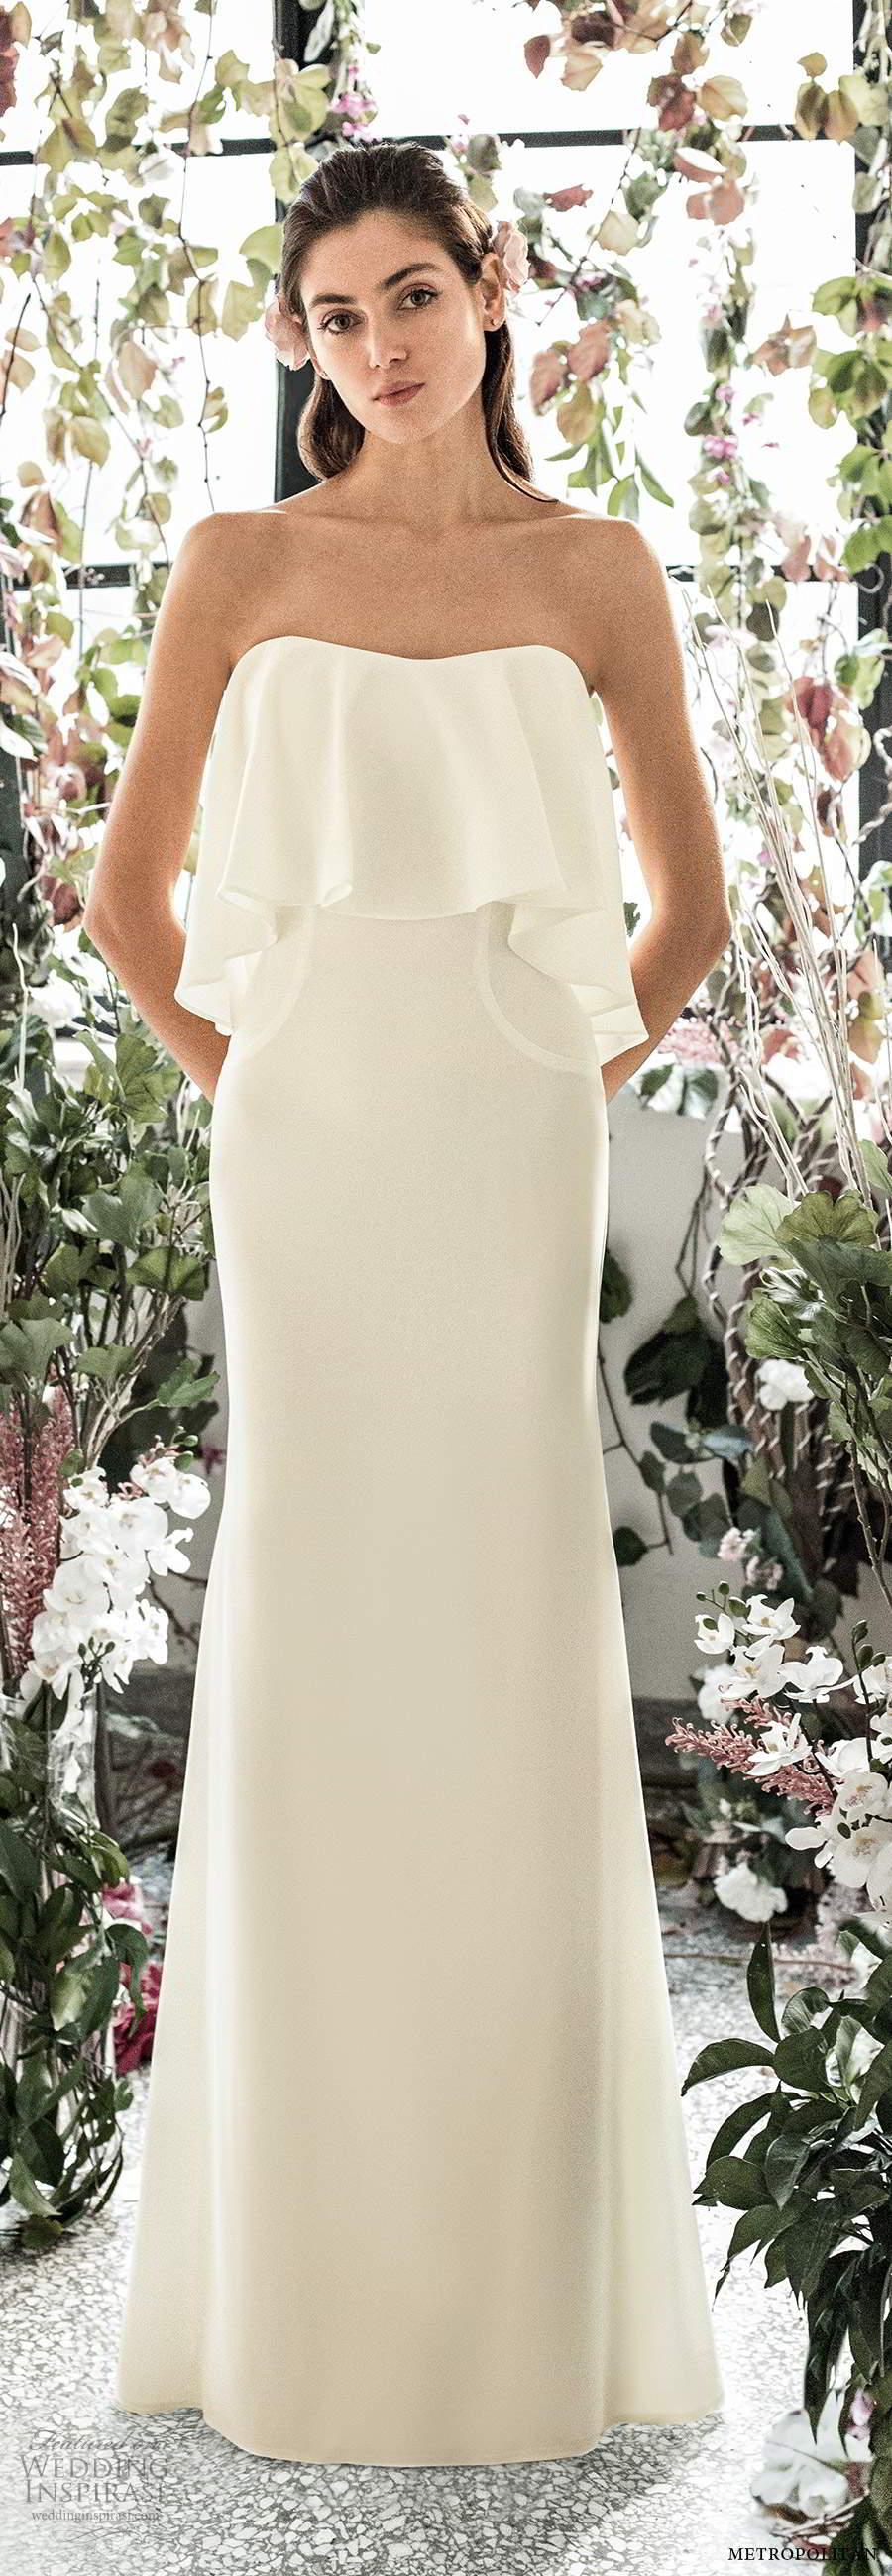 metropolitan spring 2020 bridal strapless semi sweetheart clean minimalist sheath fit flare wedding dress chapel train (15) mv